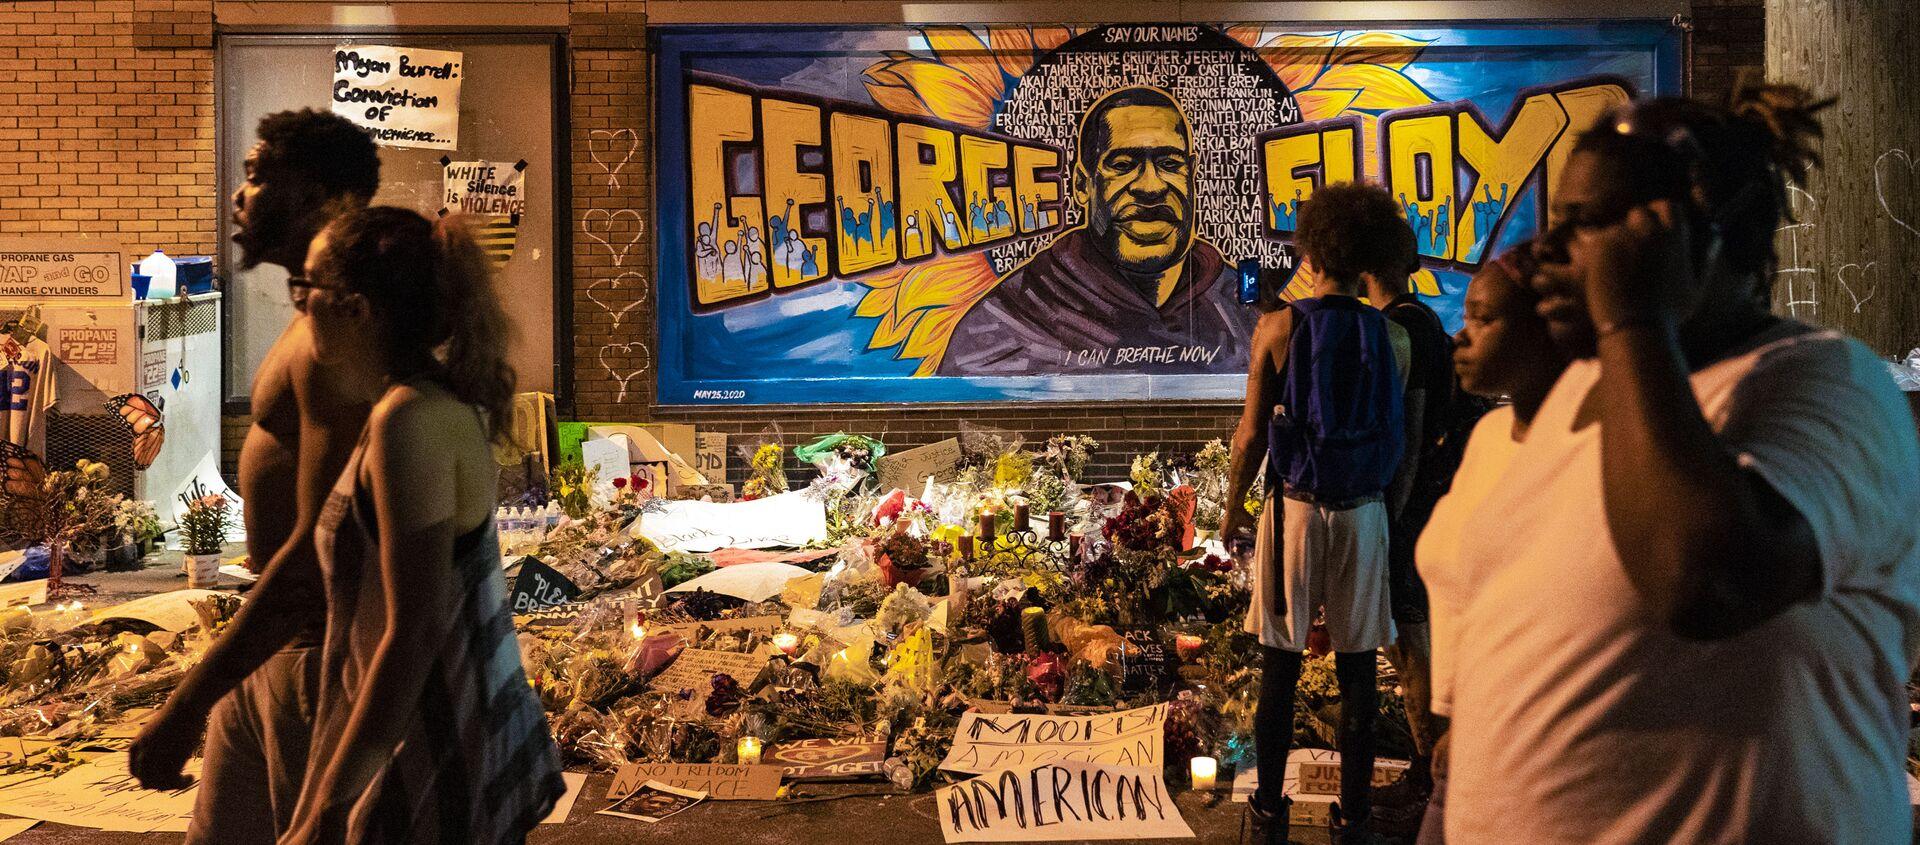 L'omaggio della street art a George Floyd - Sputnik Italia, 1920, 29.03.2021